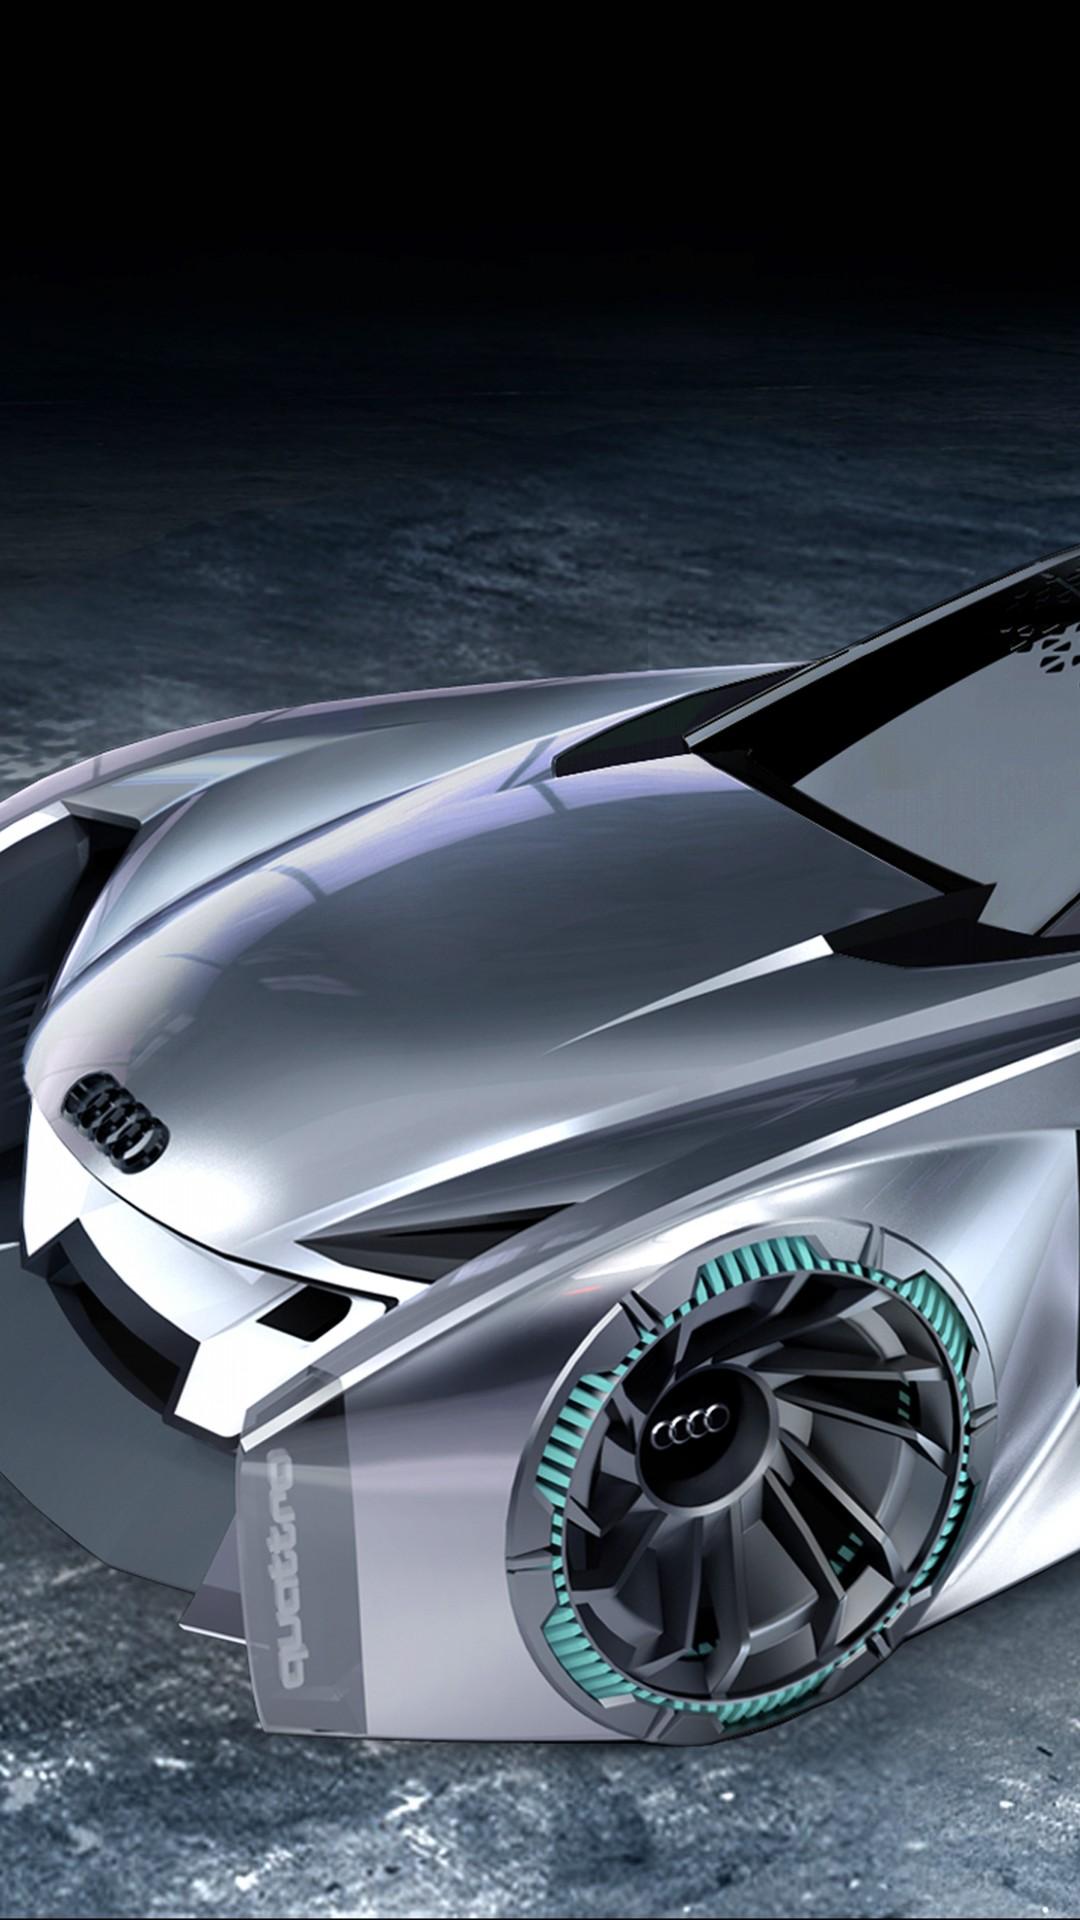 Wallpaper Audi PAON 2030, supercar, 4K, Cars & Bikes #20312